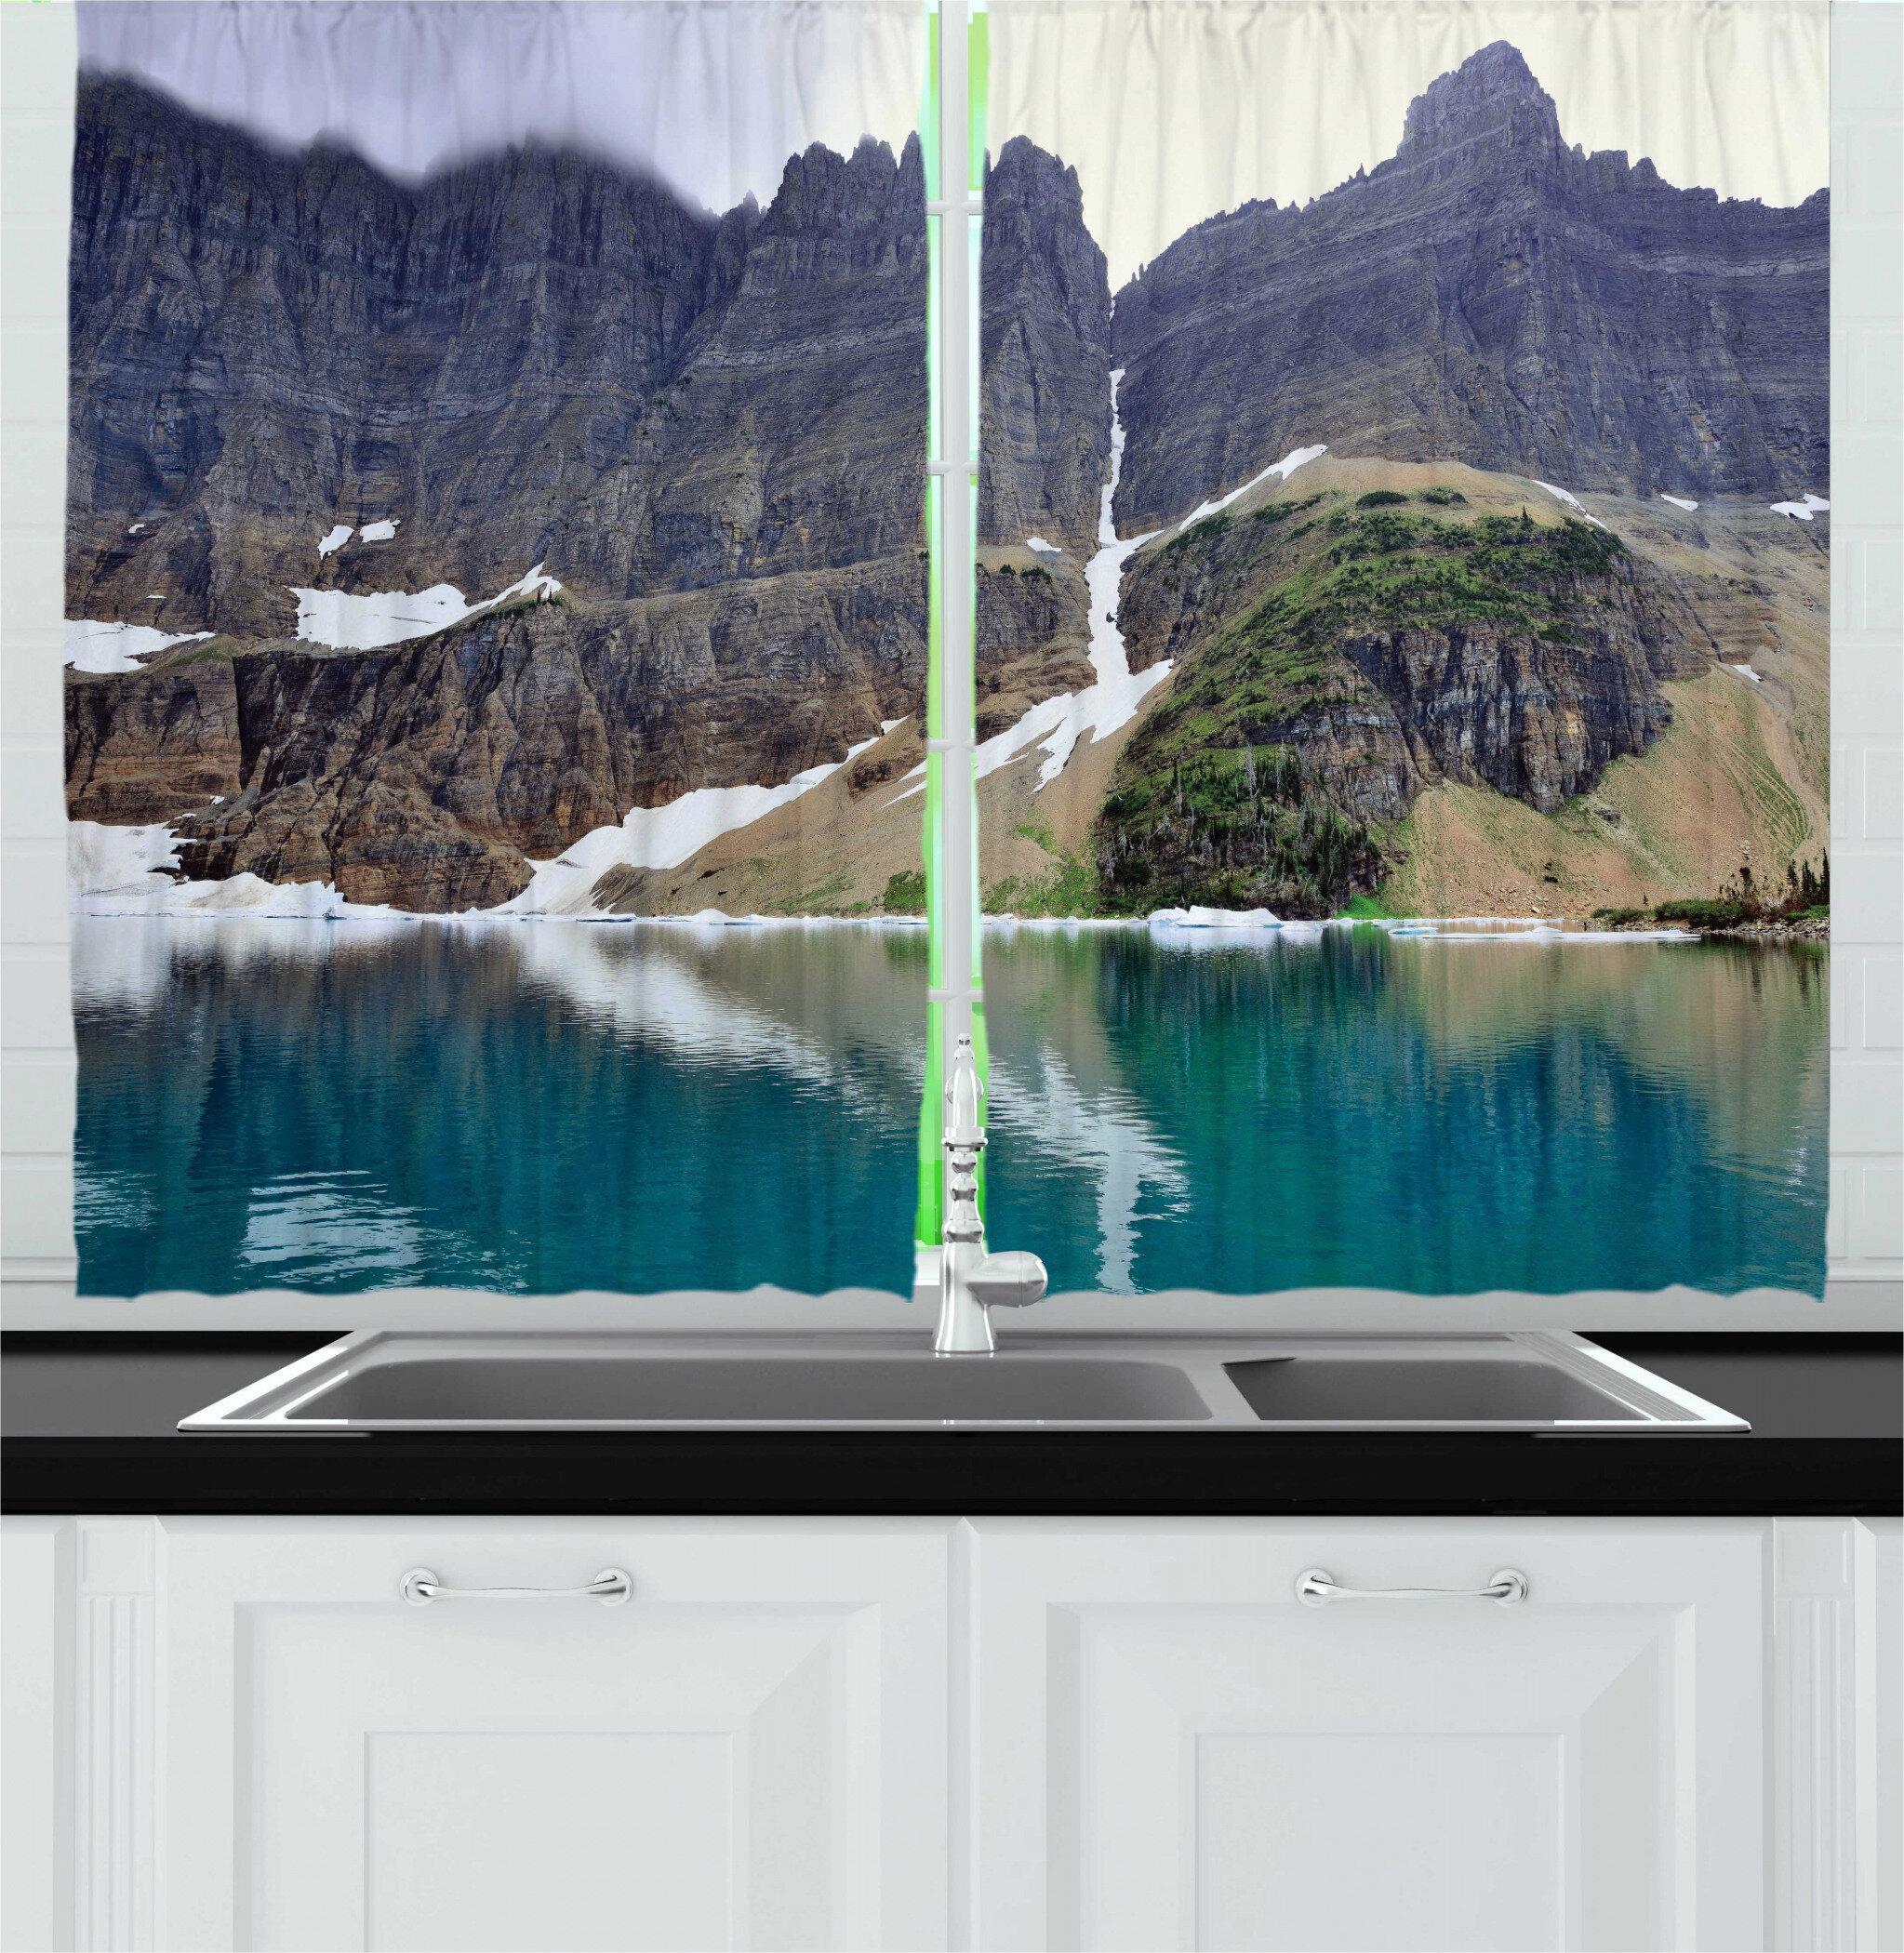 Park Design Valances Kitchen Curtains You Ll Love In 2021 Wayfair